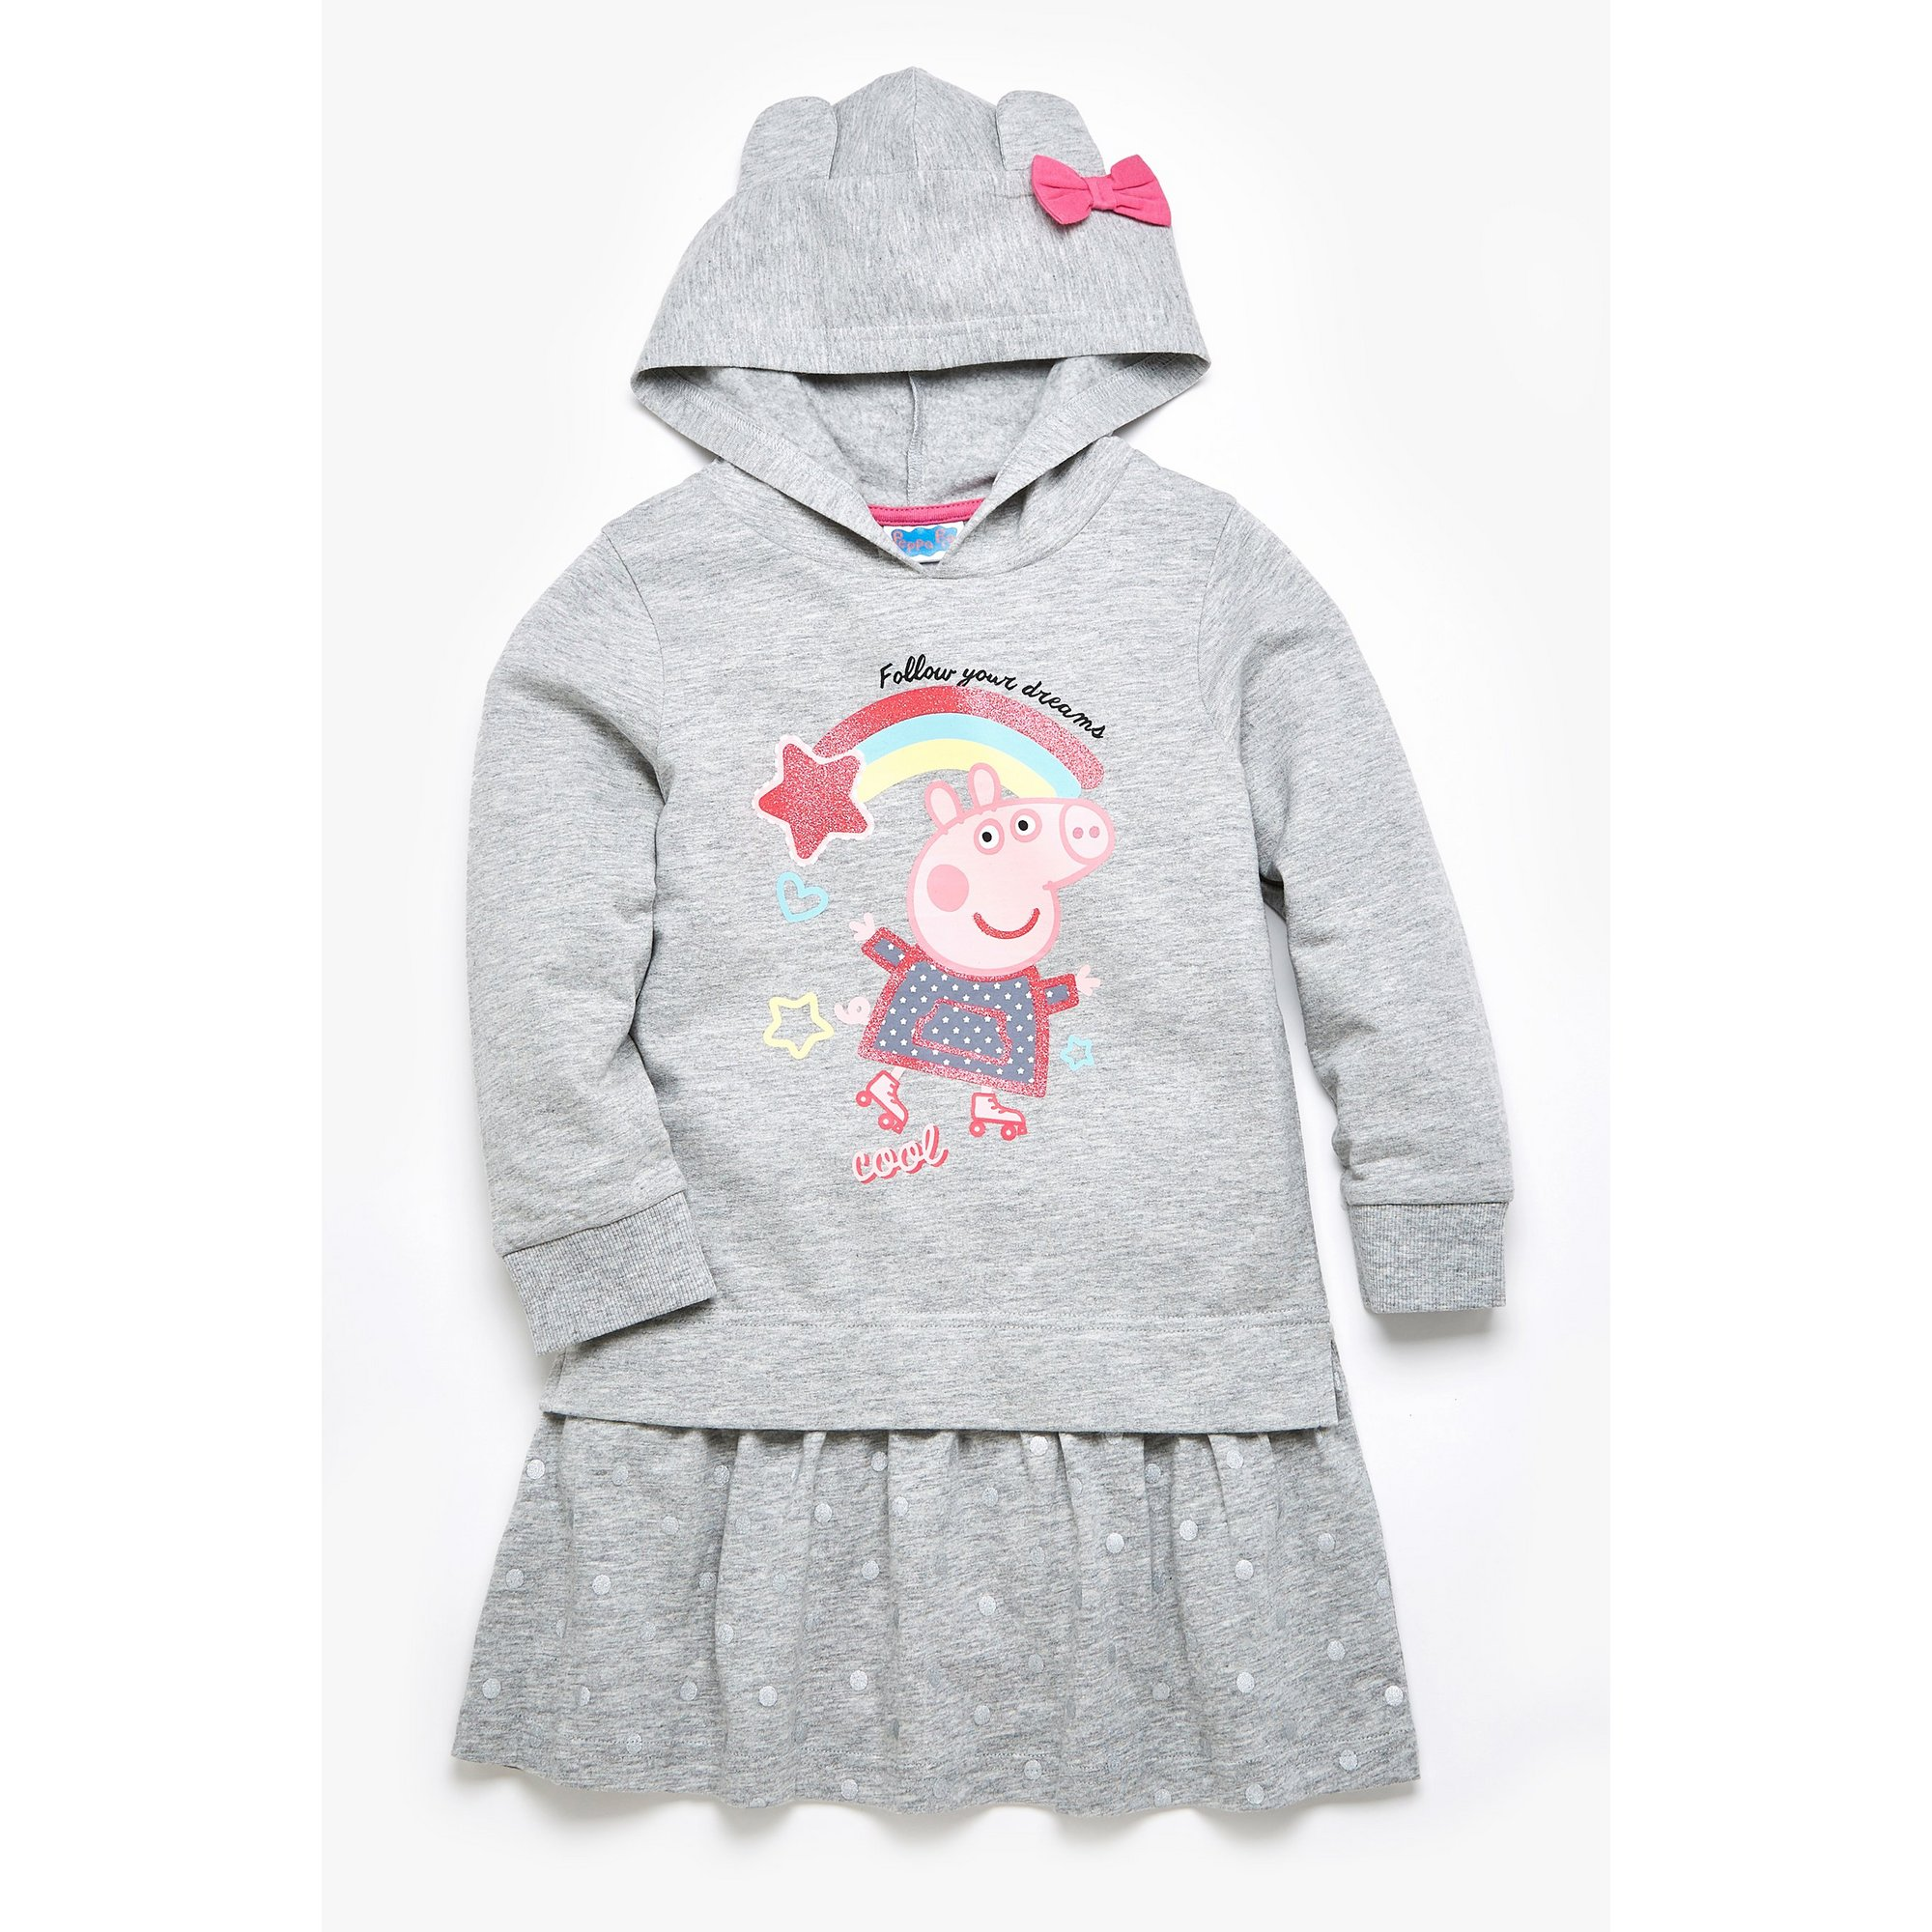 Image of Girls Peppa Pig Grey Hooded Sweatdress